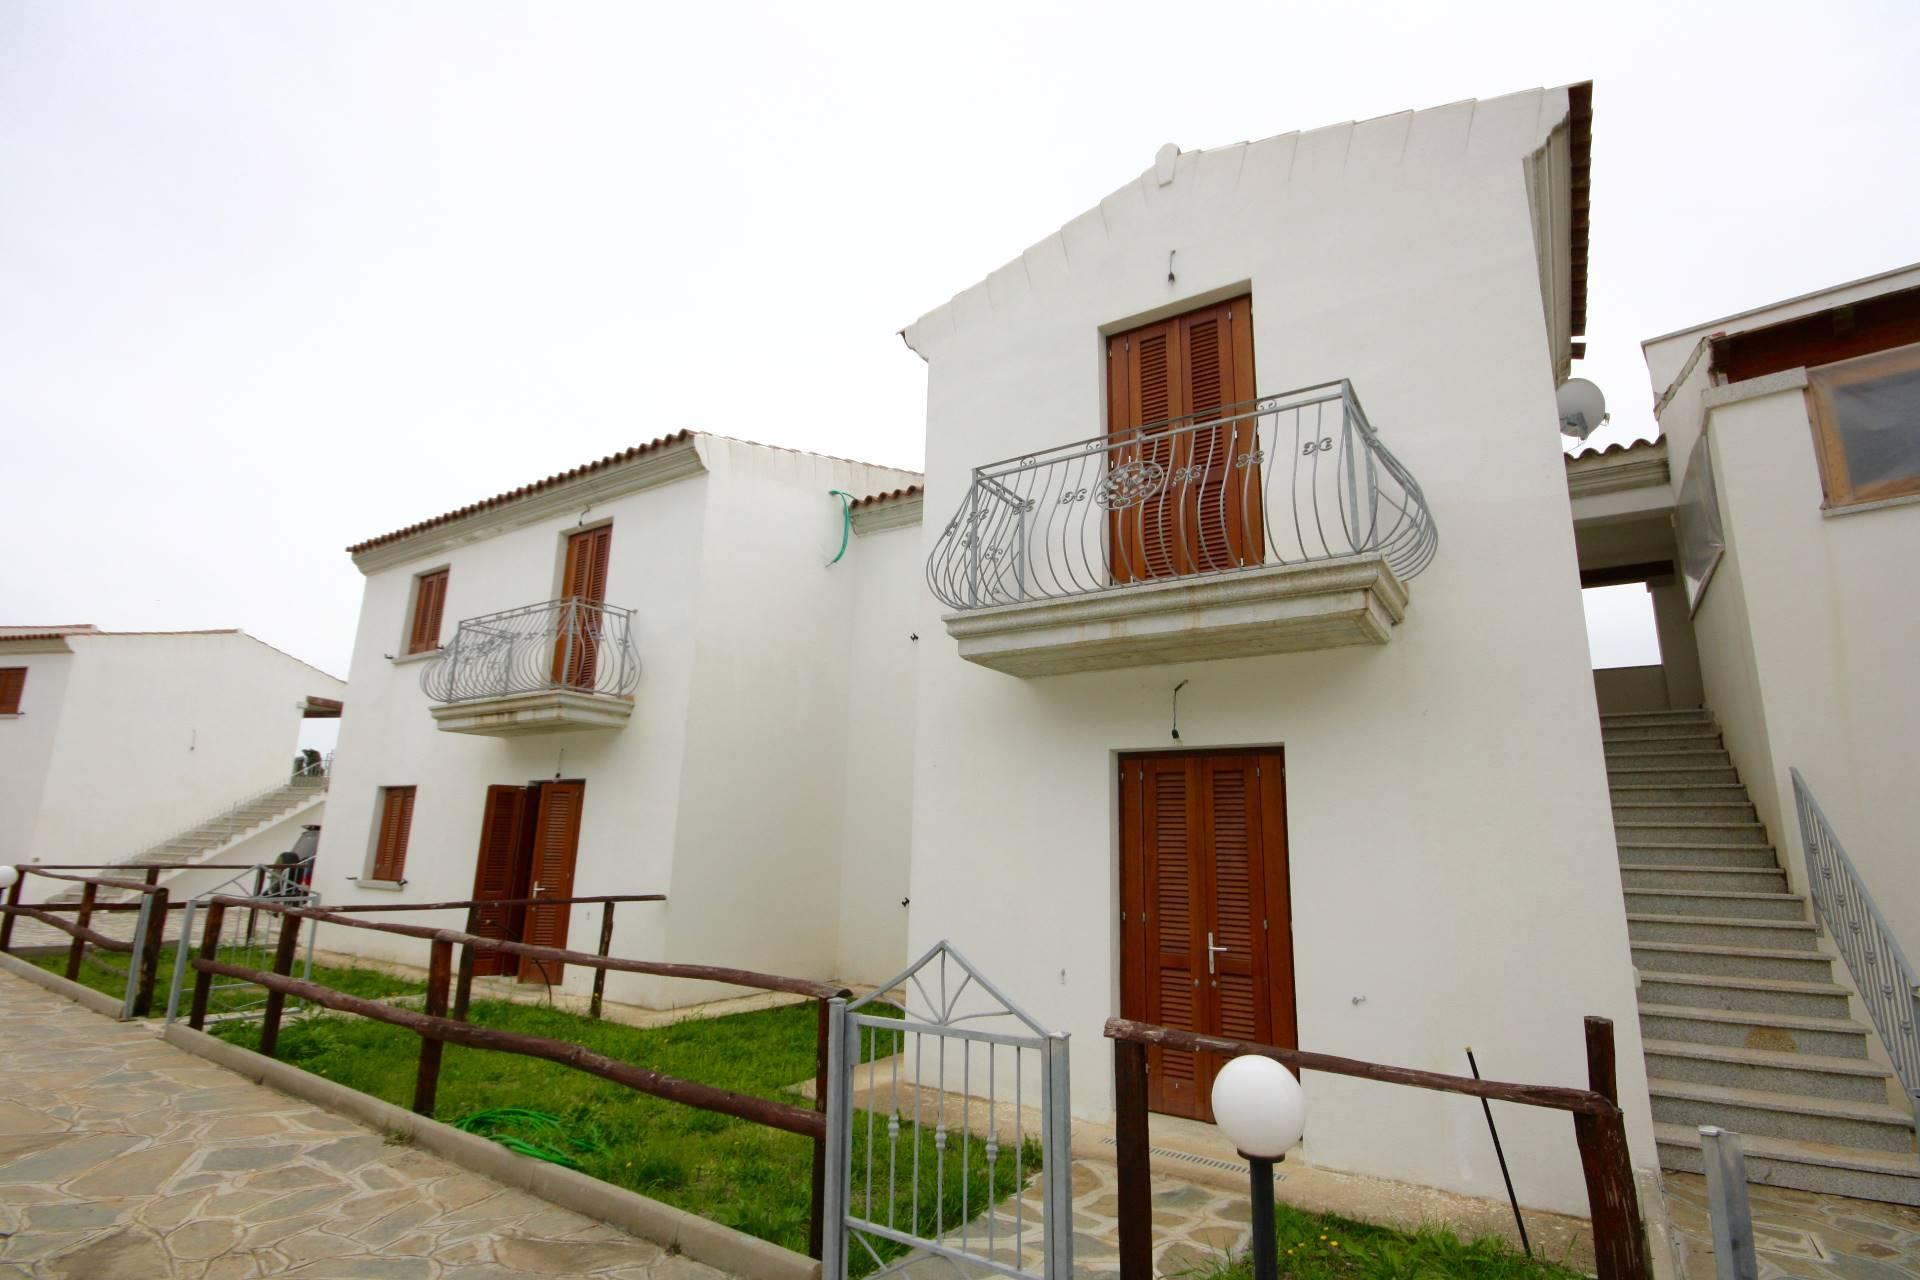 Casa budoni appartamenti e case in vendita a budoni for Case in vendita a tanaunella